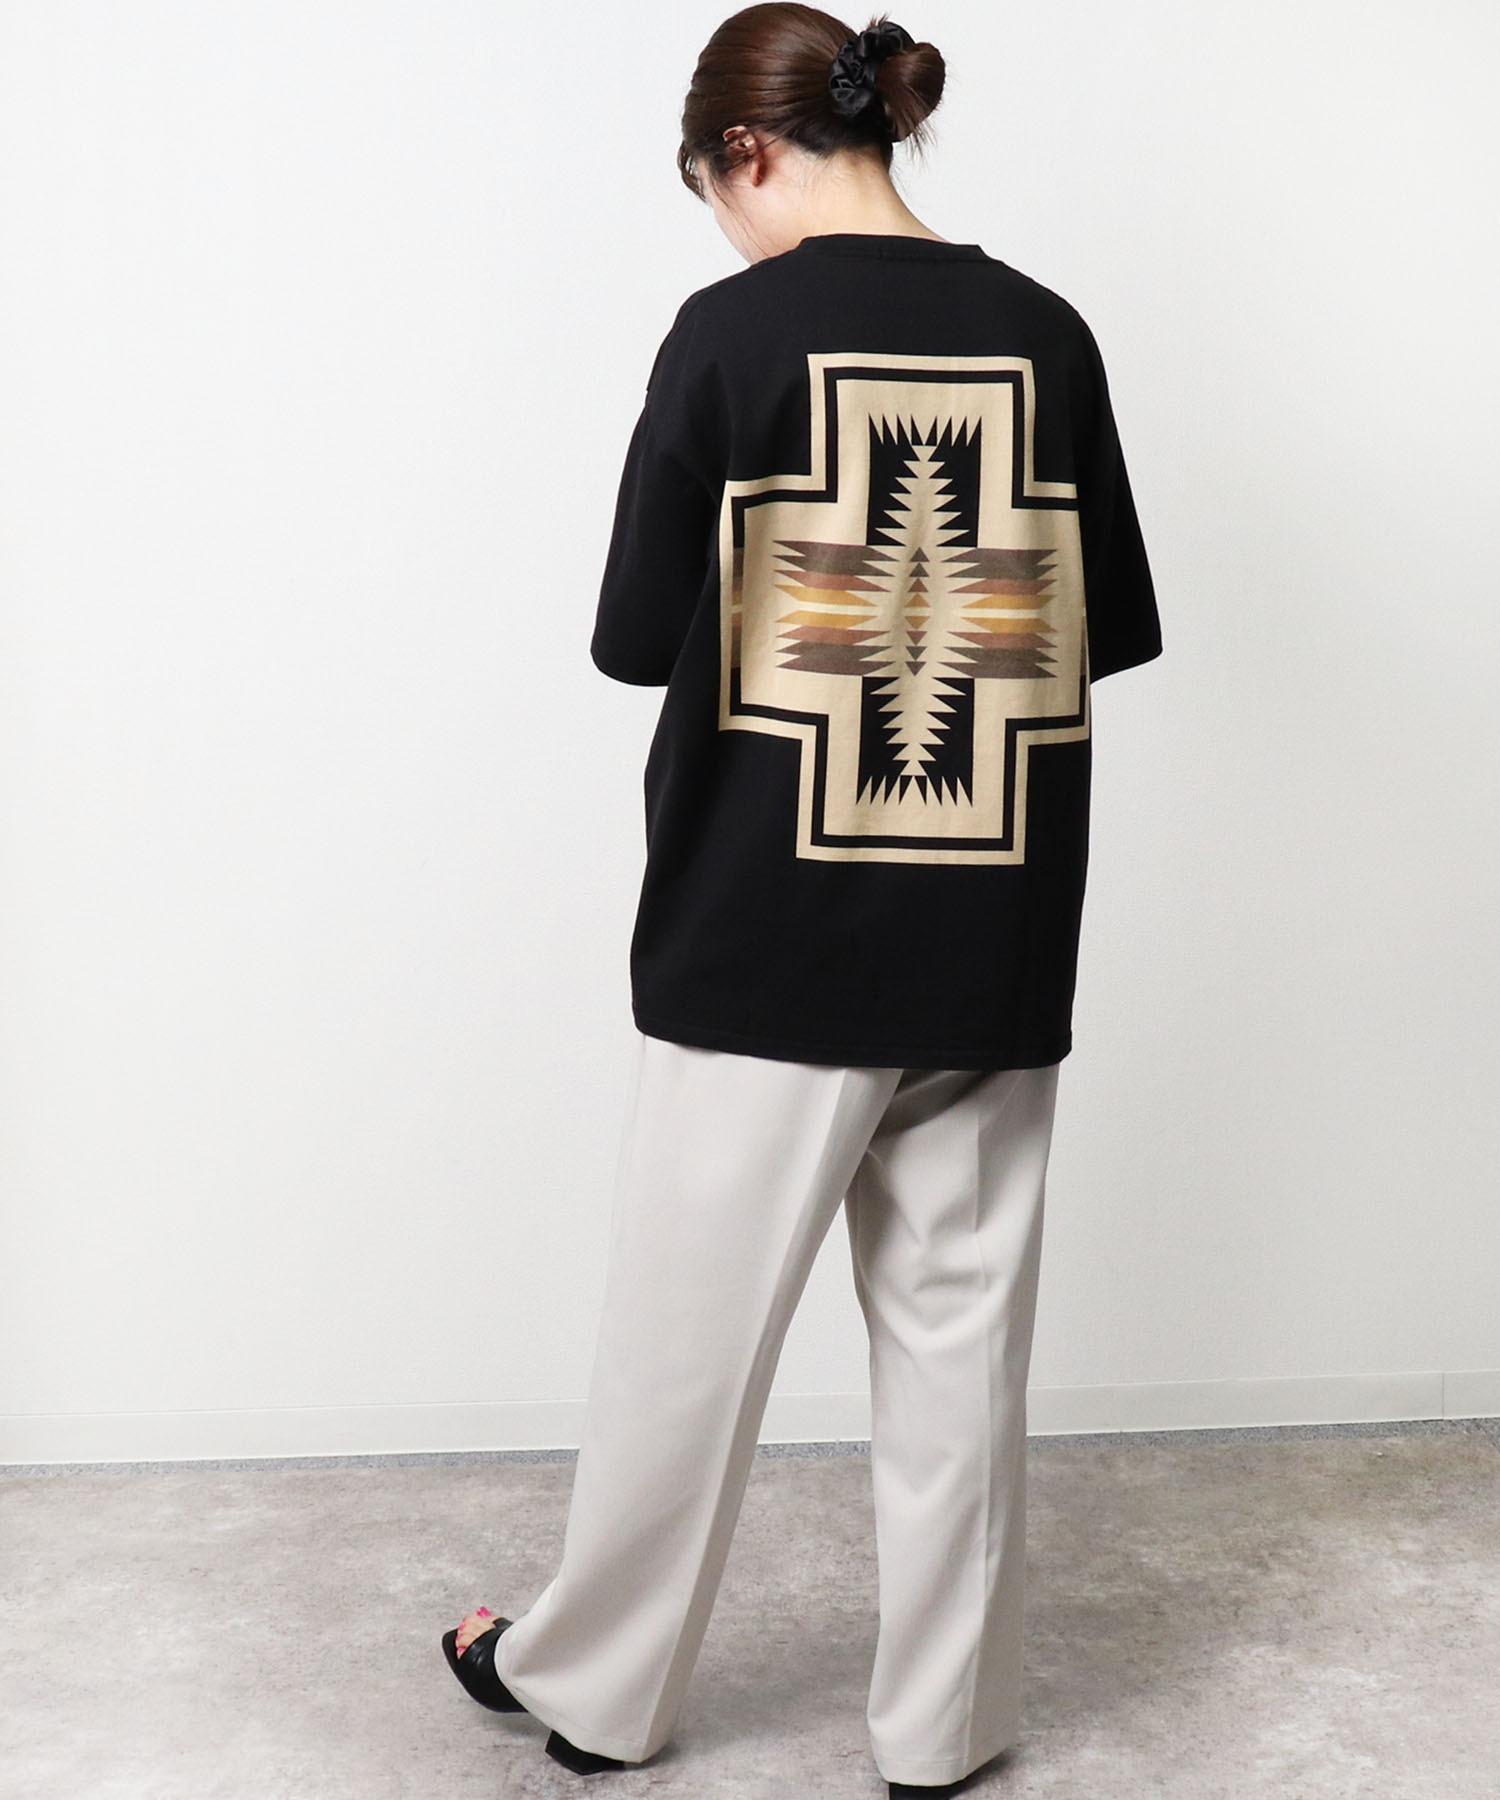 GO OUT 2021年 5月号p.56掲載 【 PENDLETON / ペンドルトン 】 PENDLETON UNISEX Back Print Tee / バックプリント ポケット半袖 Tシャツ ポケT